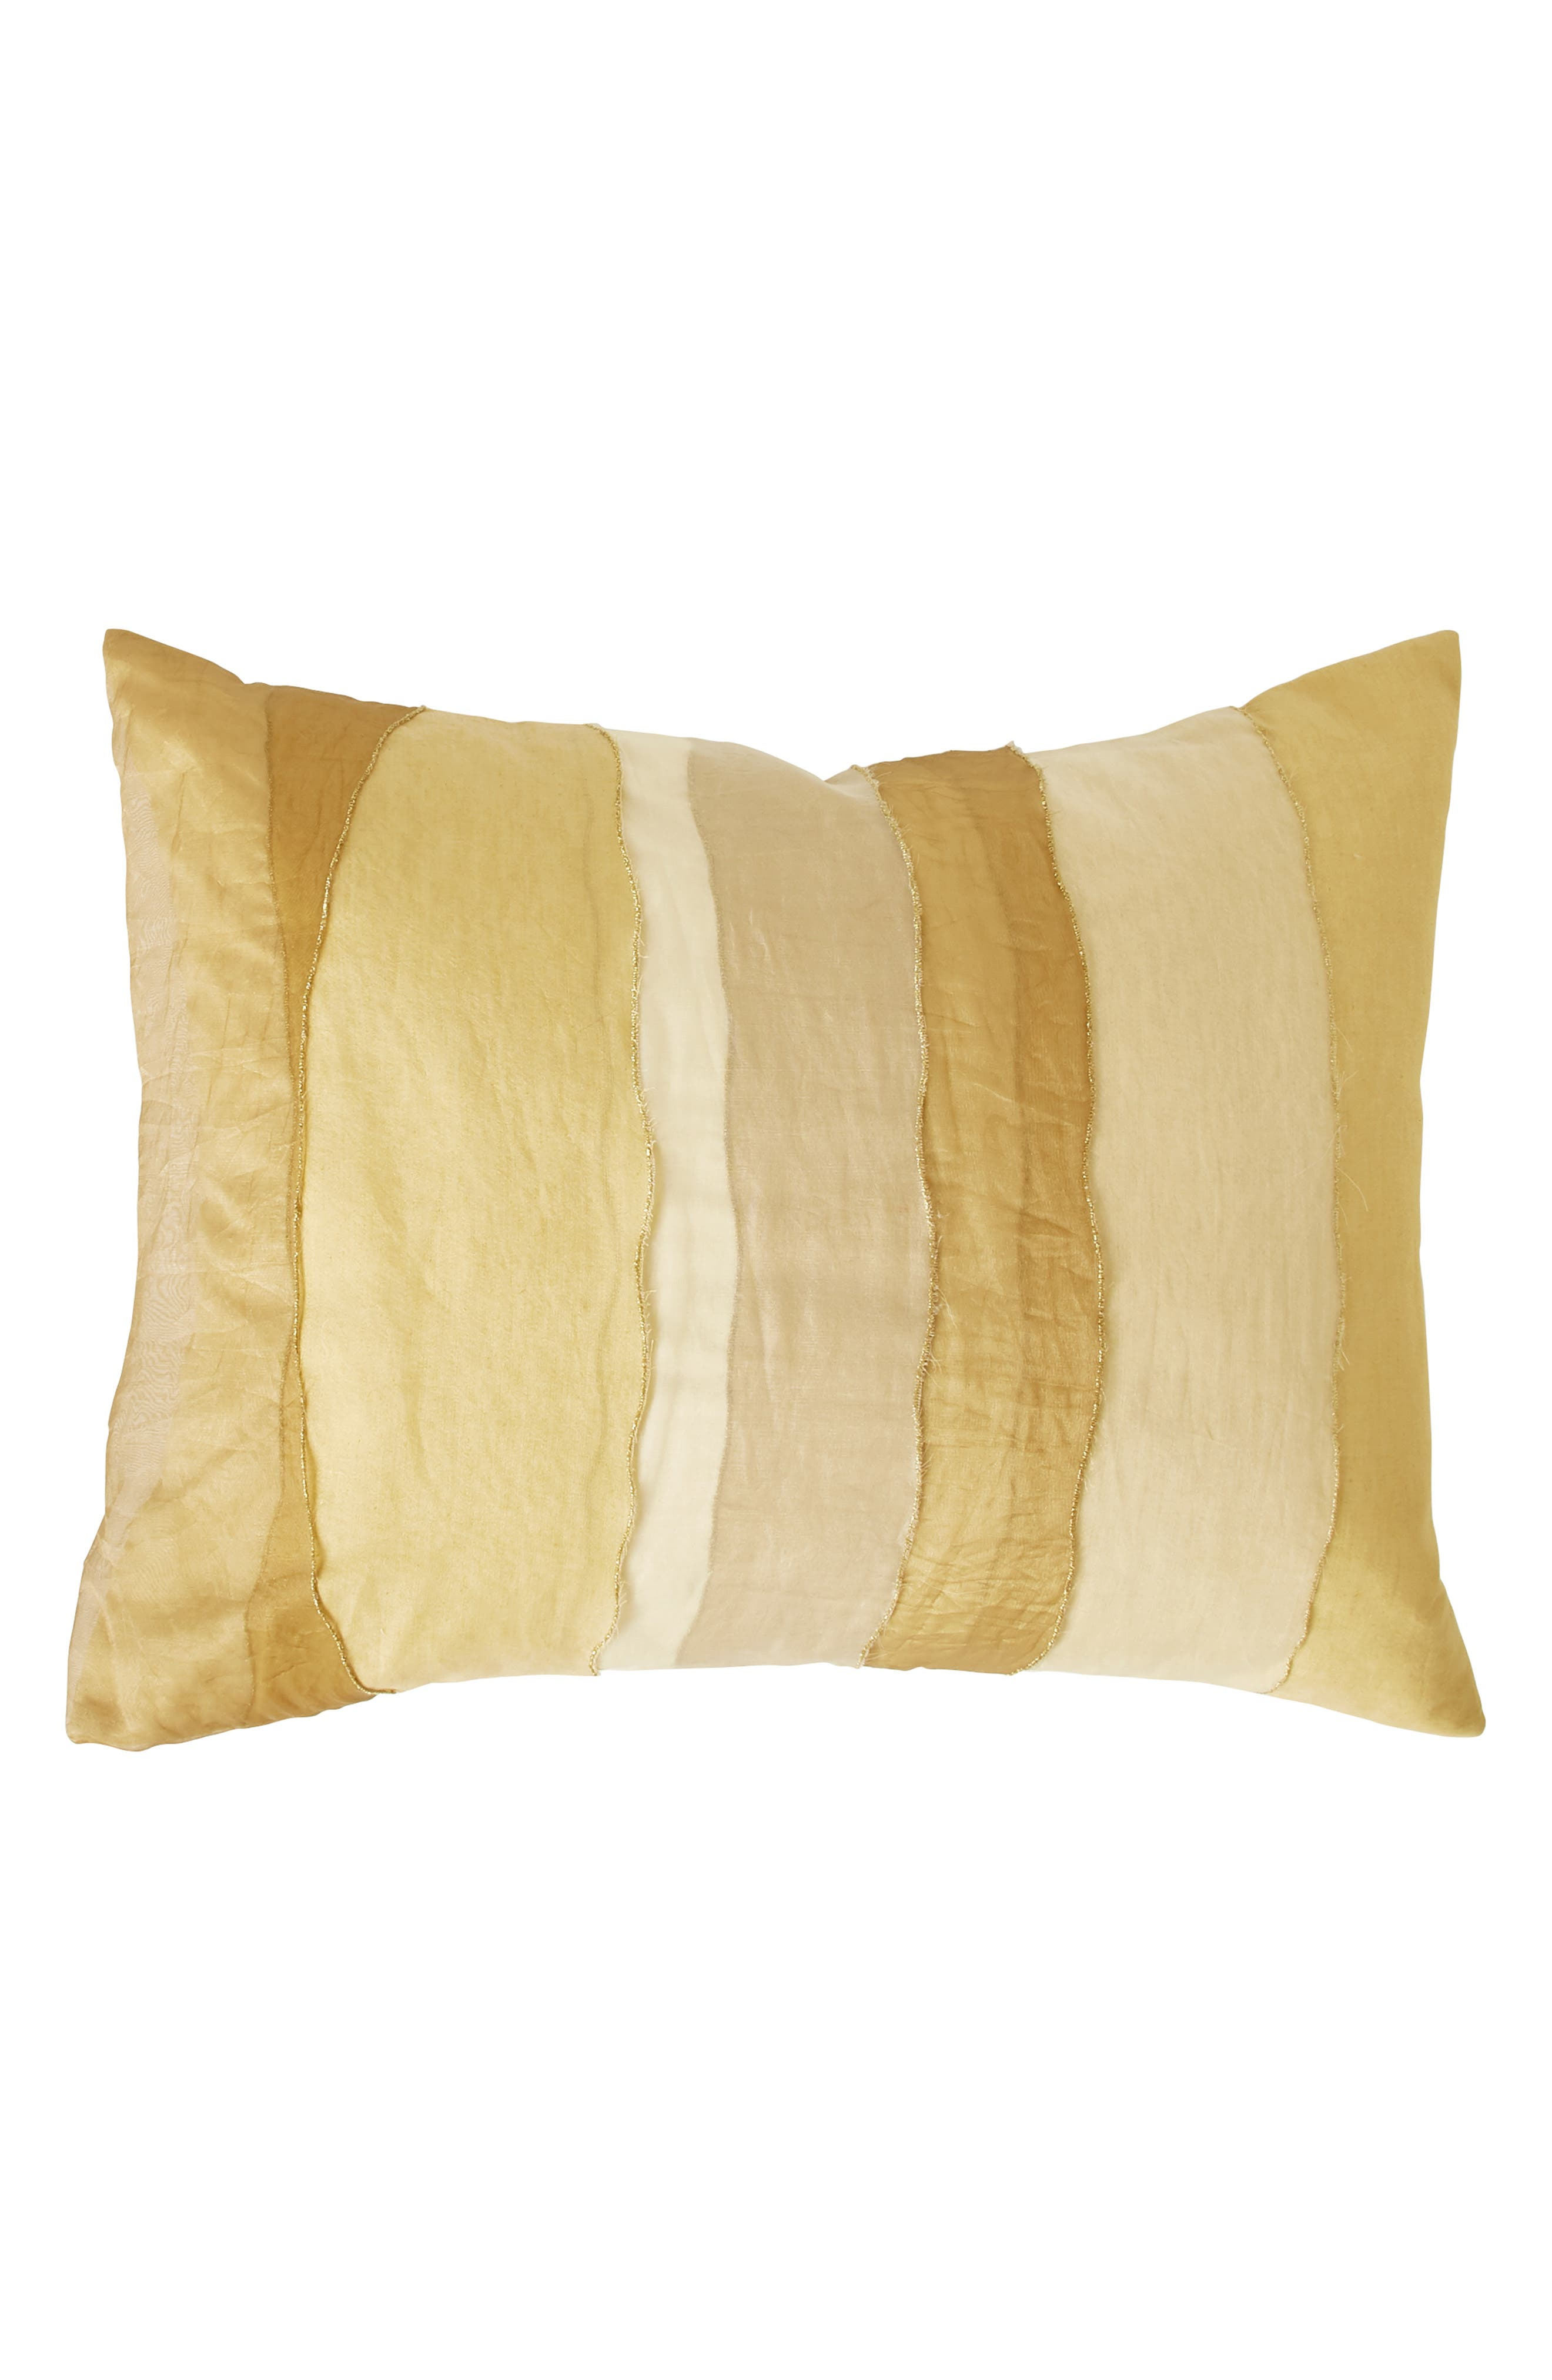 DONNA KARAN NEW YORK Gilded Sheer Layered Accent Pillow, Main, color, GOLD